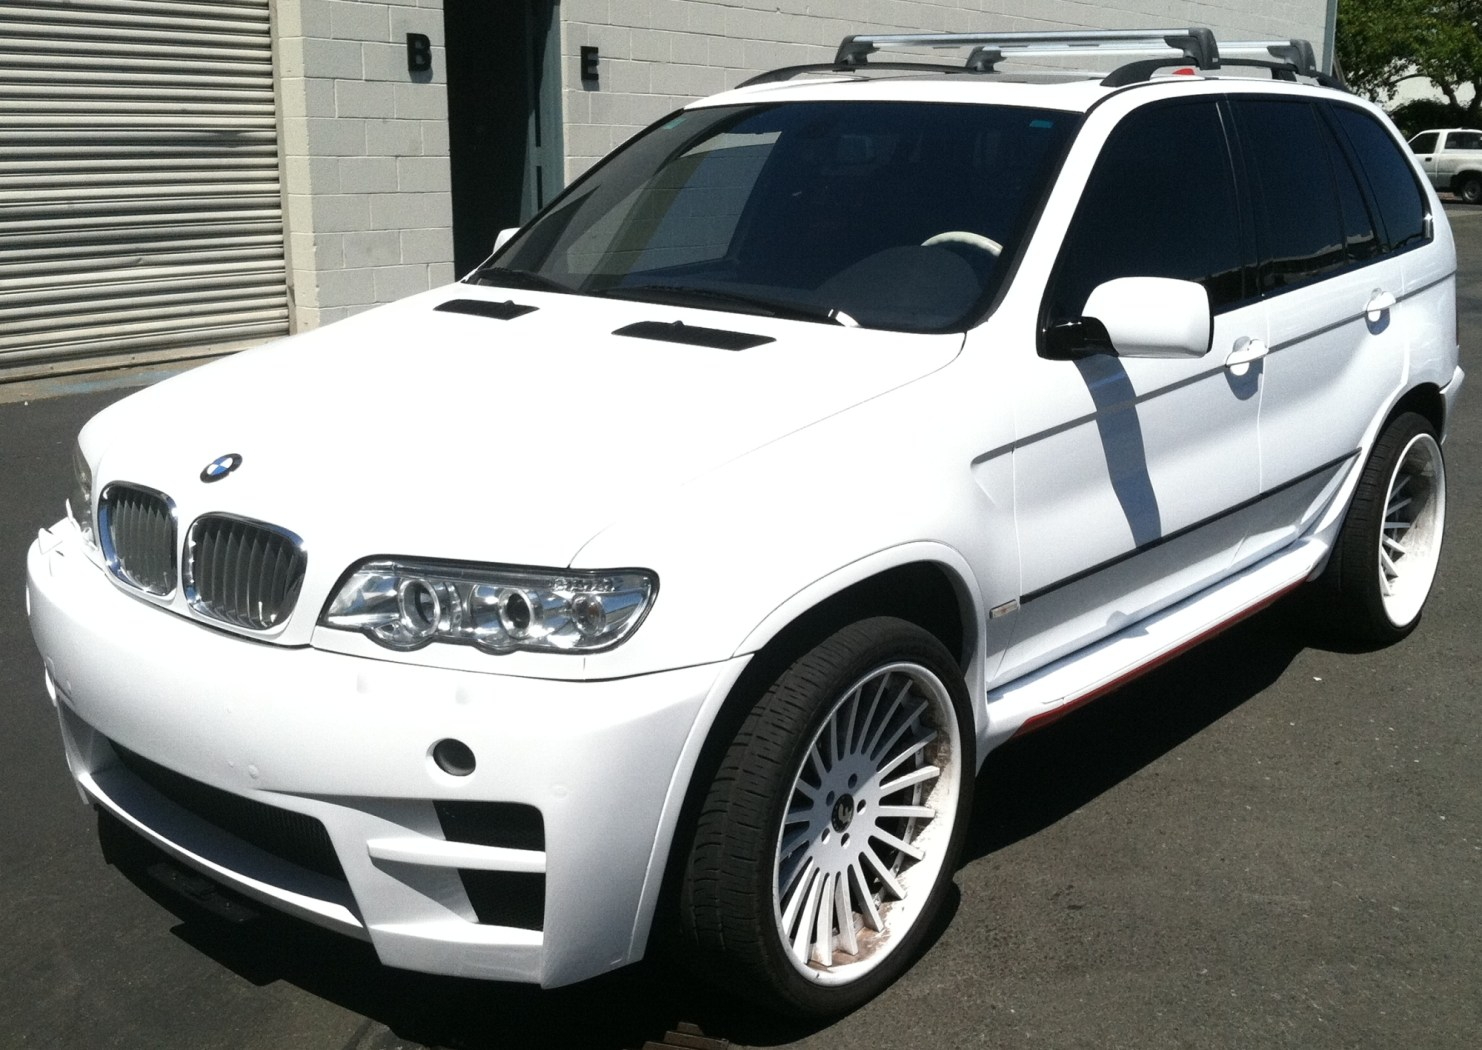 BMW Suv Color Change Wrap-22